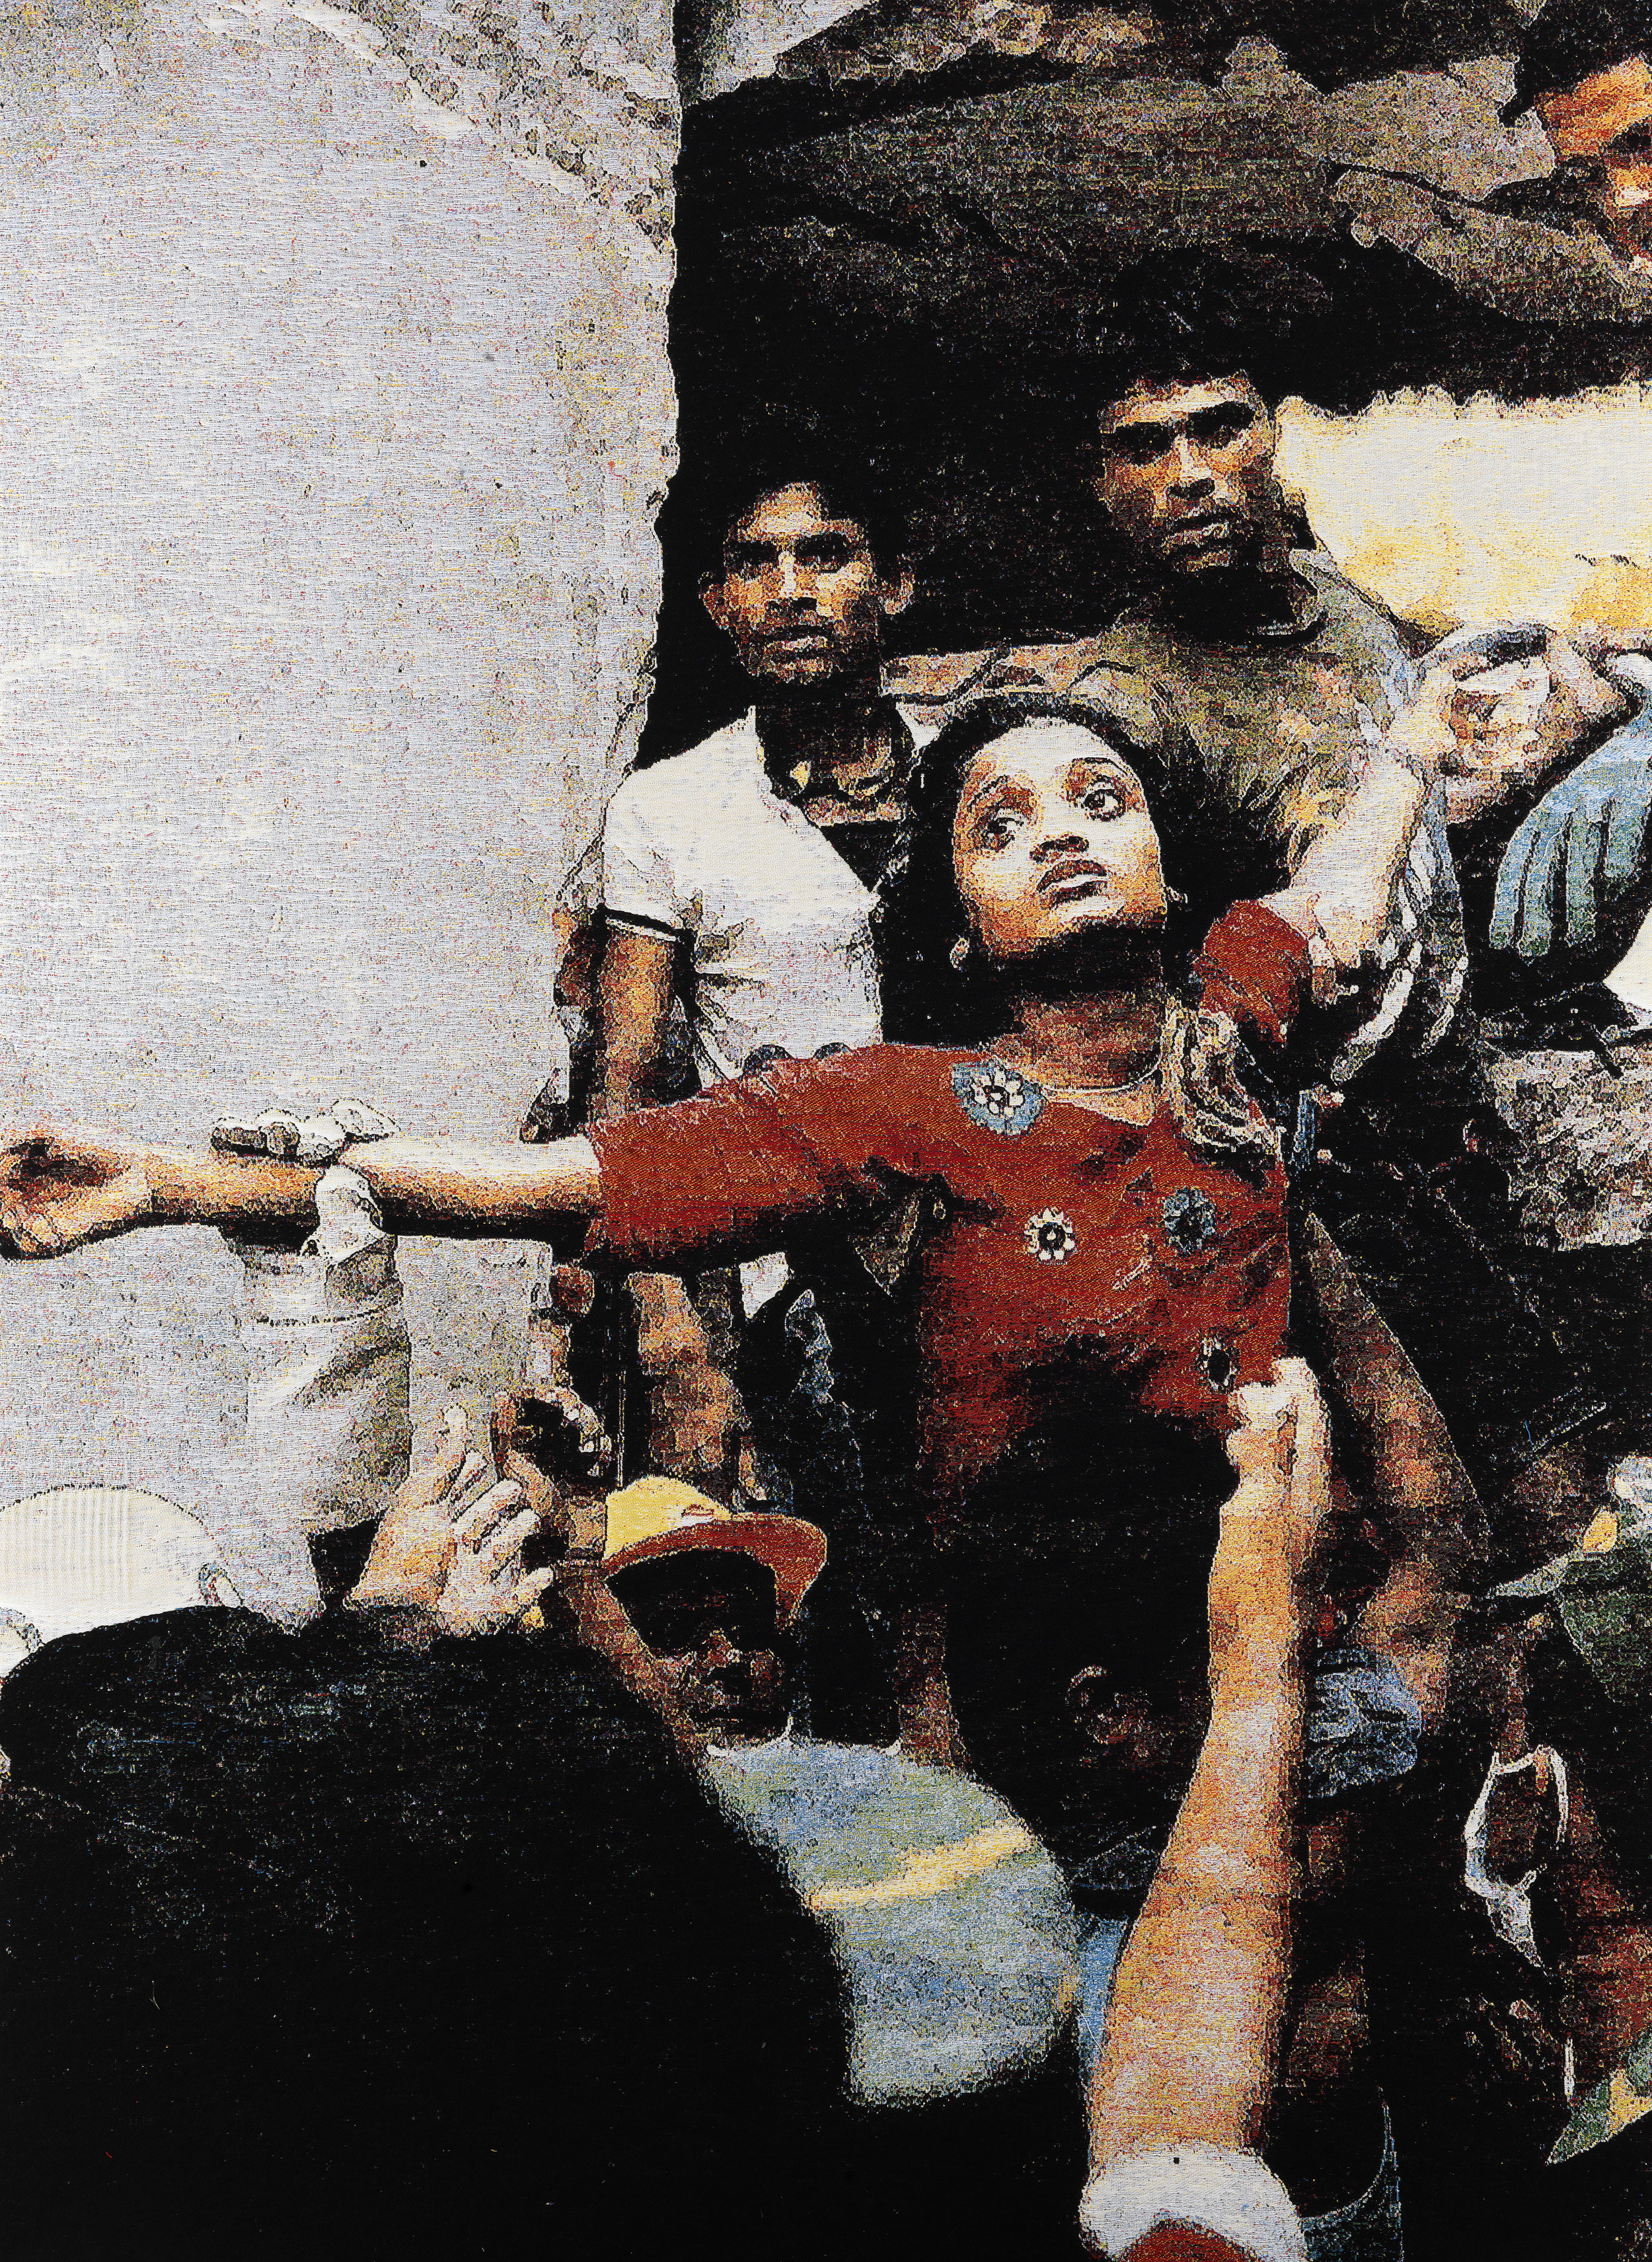 Faith 2014: Bangladesh, Jacquard woven, 205 x 148 cm